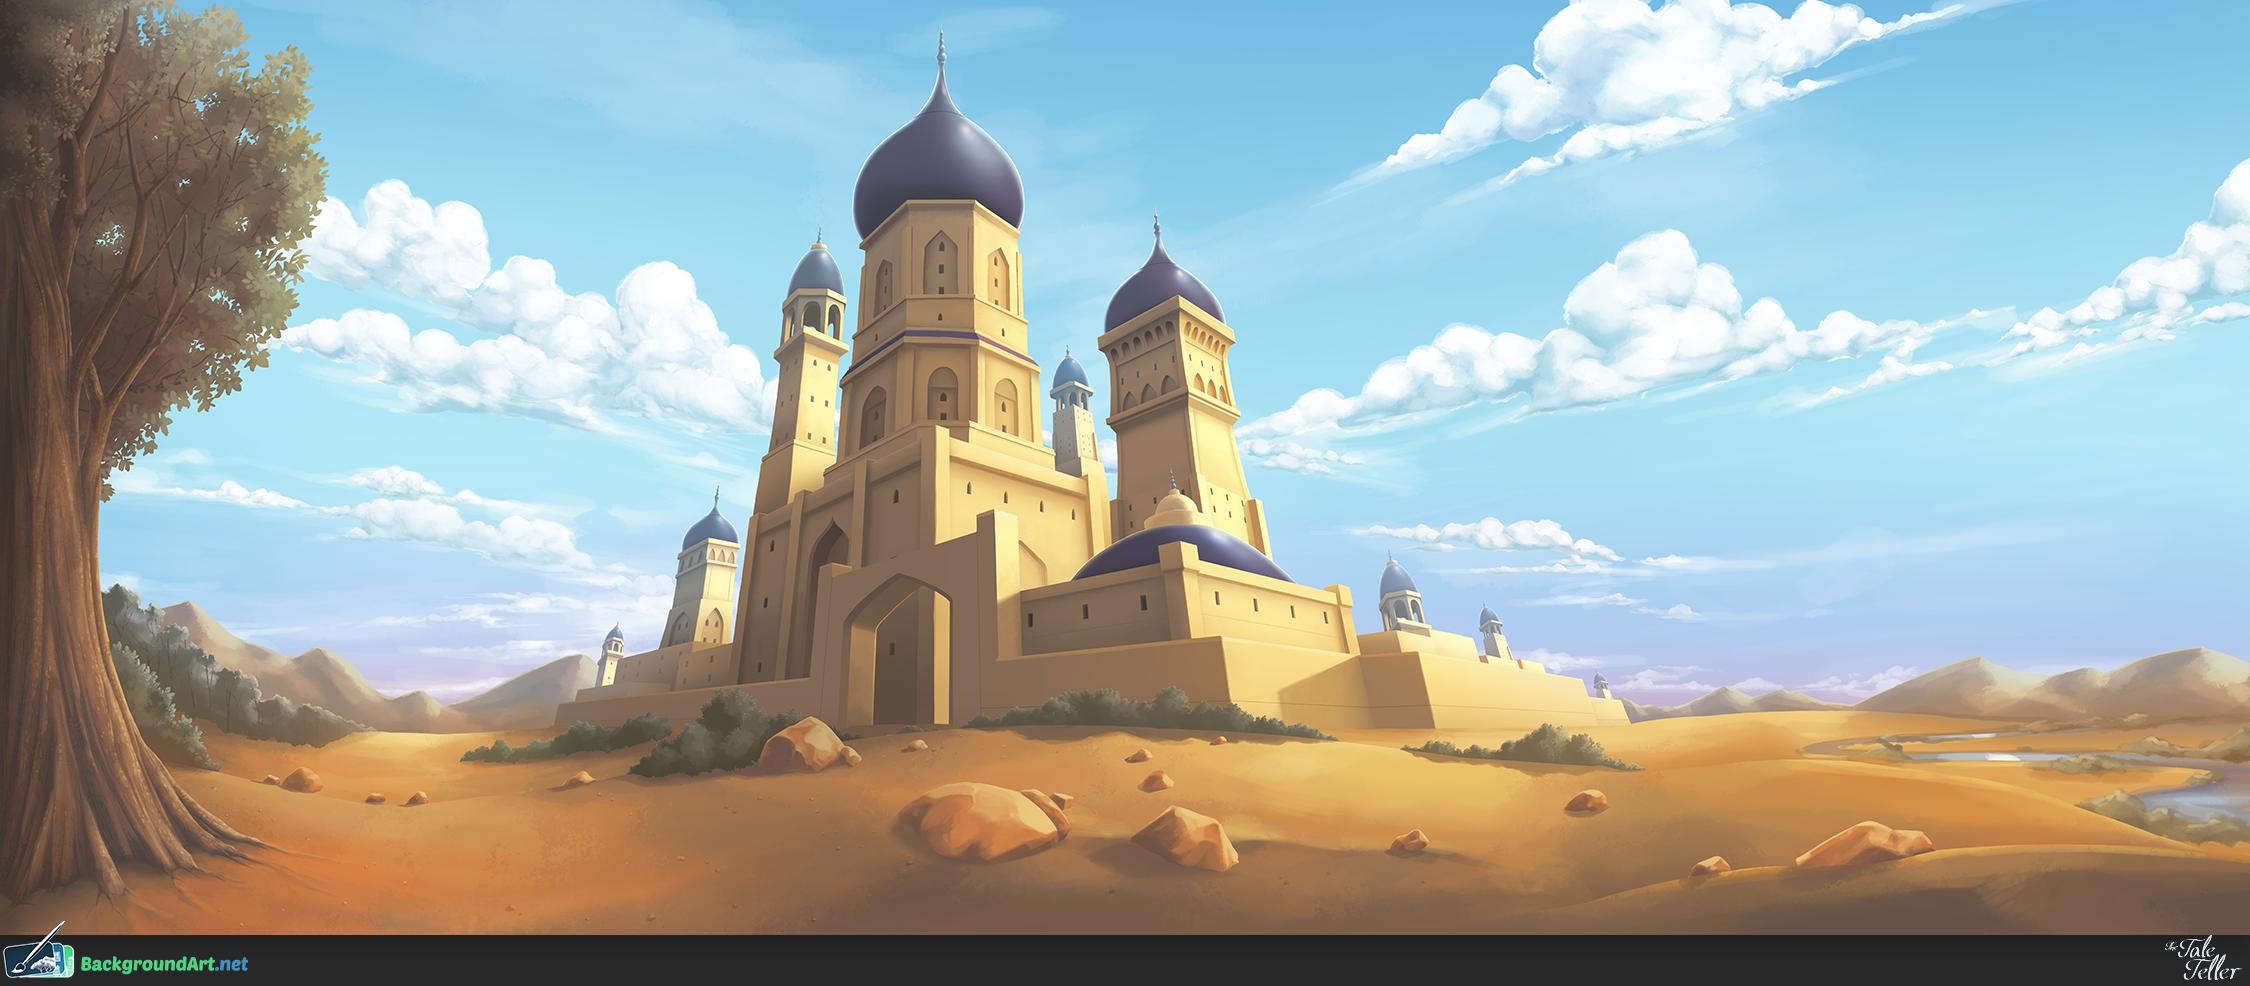 Fantasy Kingdom - The Tale Teller